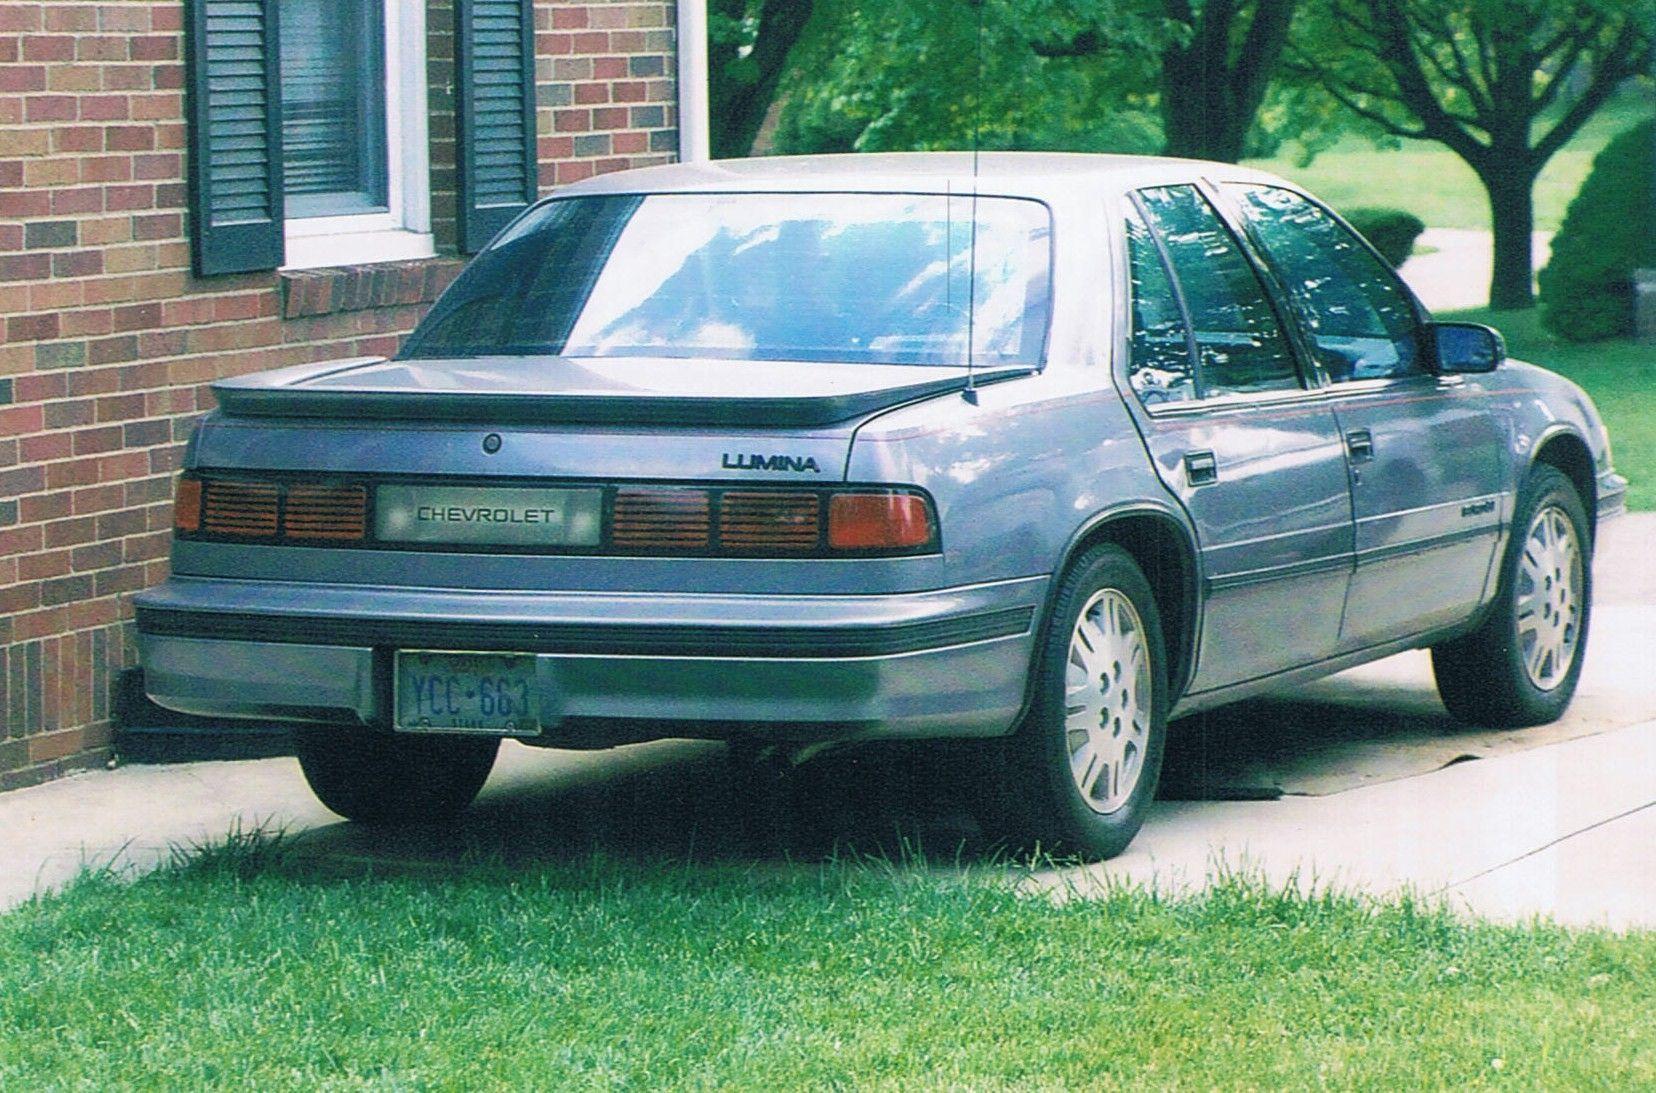 1991 chevy lumina euro 3.1 | chevrolet lumina | pinterest